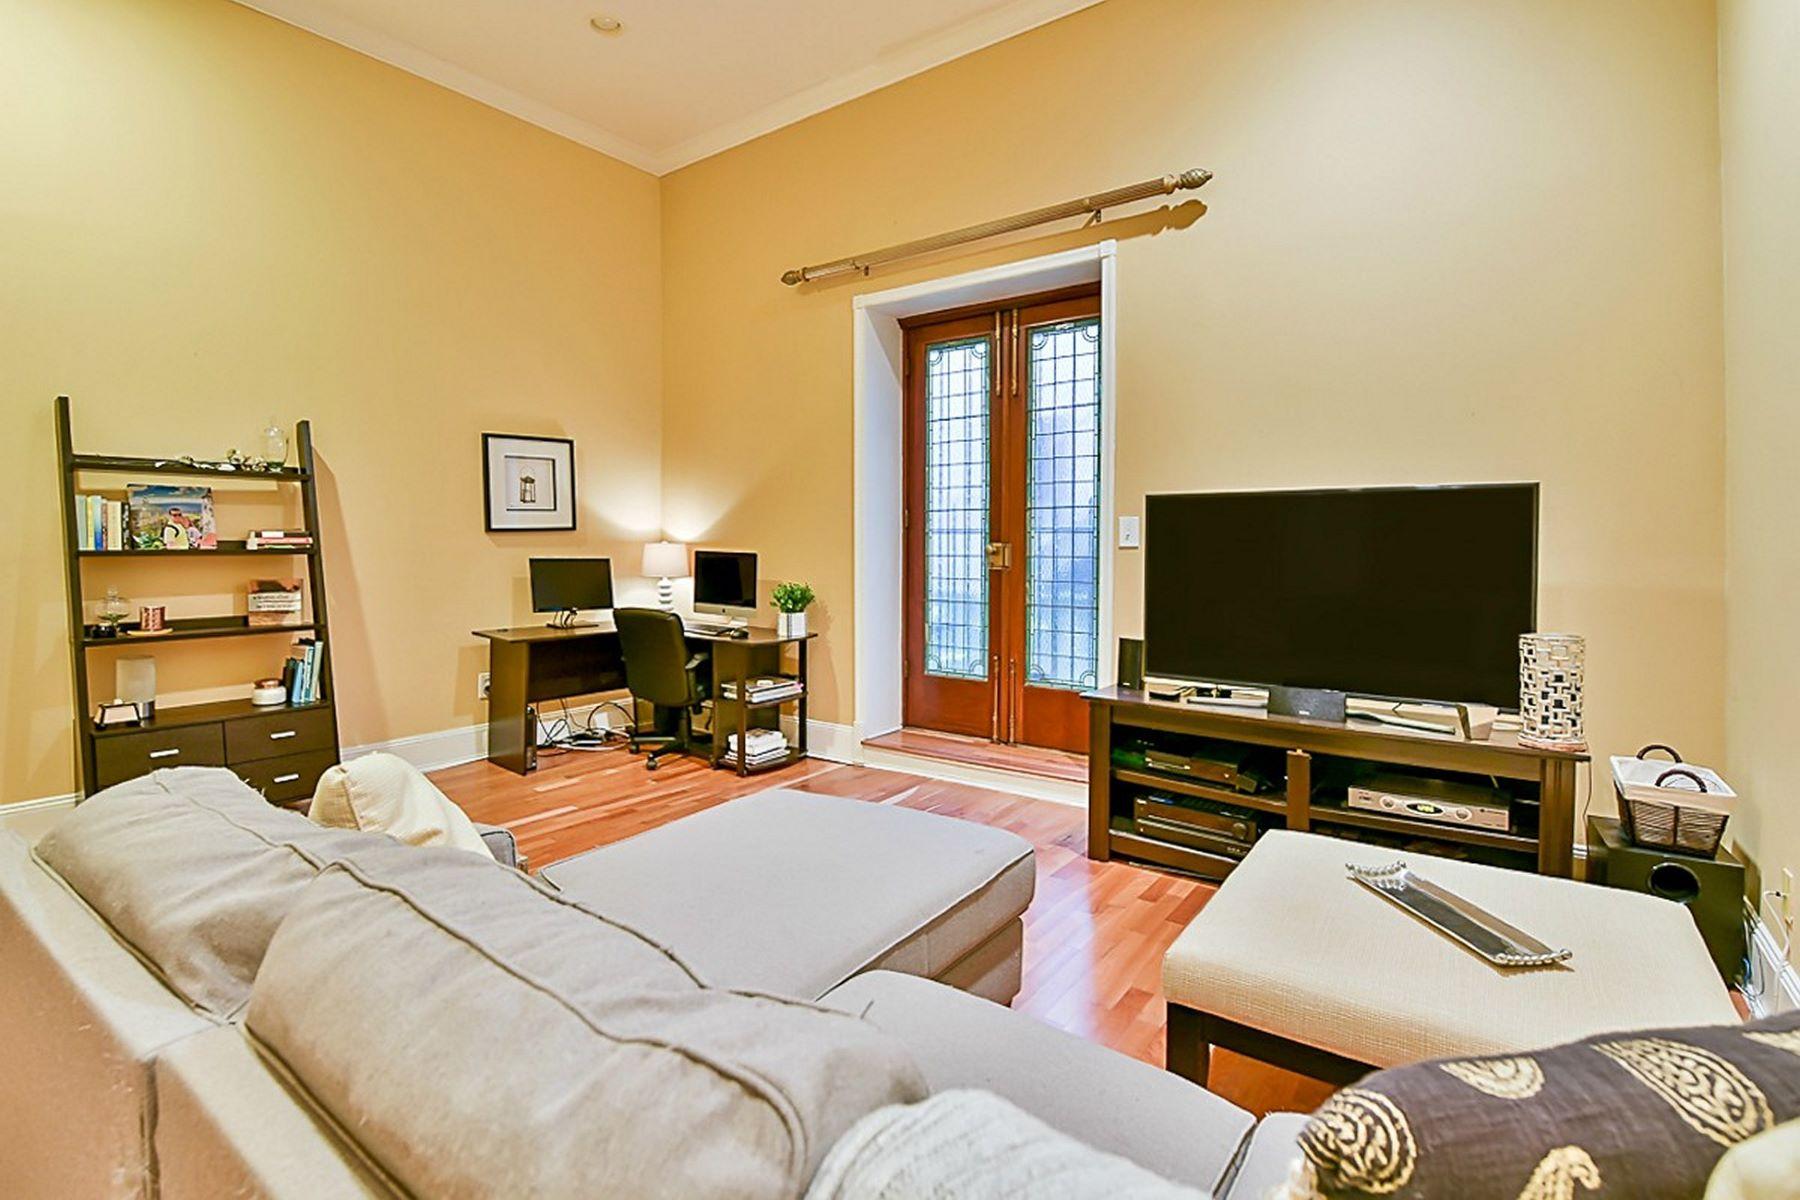 共管式独立产权公寓 为 销售 在 Fabulous One Bedroom in One of Hoboken's true Landmark 820 Hudson Street #C-2 霍博肯, 新泽西州, 07030 美国